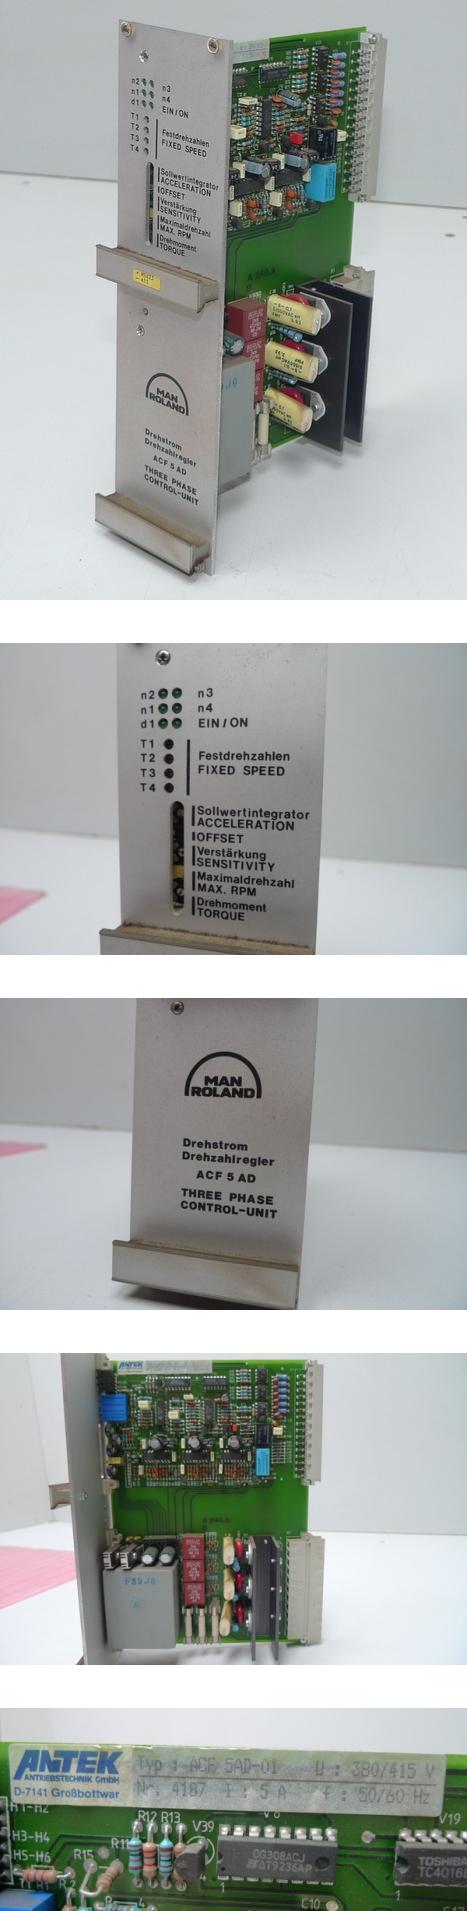 MAN Roland Antek Drehzahlregler ACF-5 AD